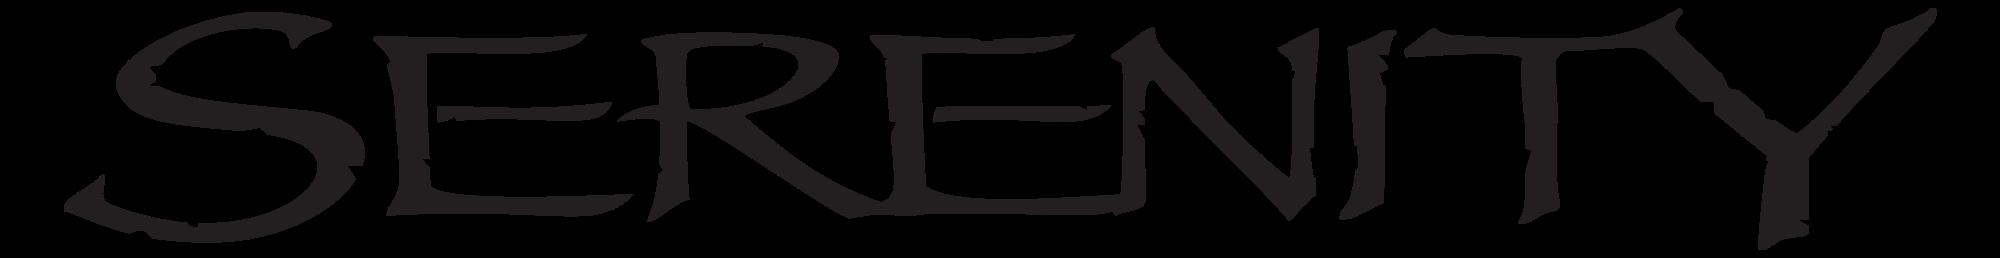 2000x258 Fileserenity Logo.svg